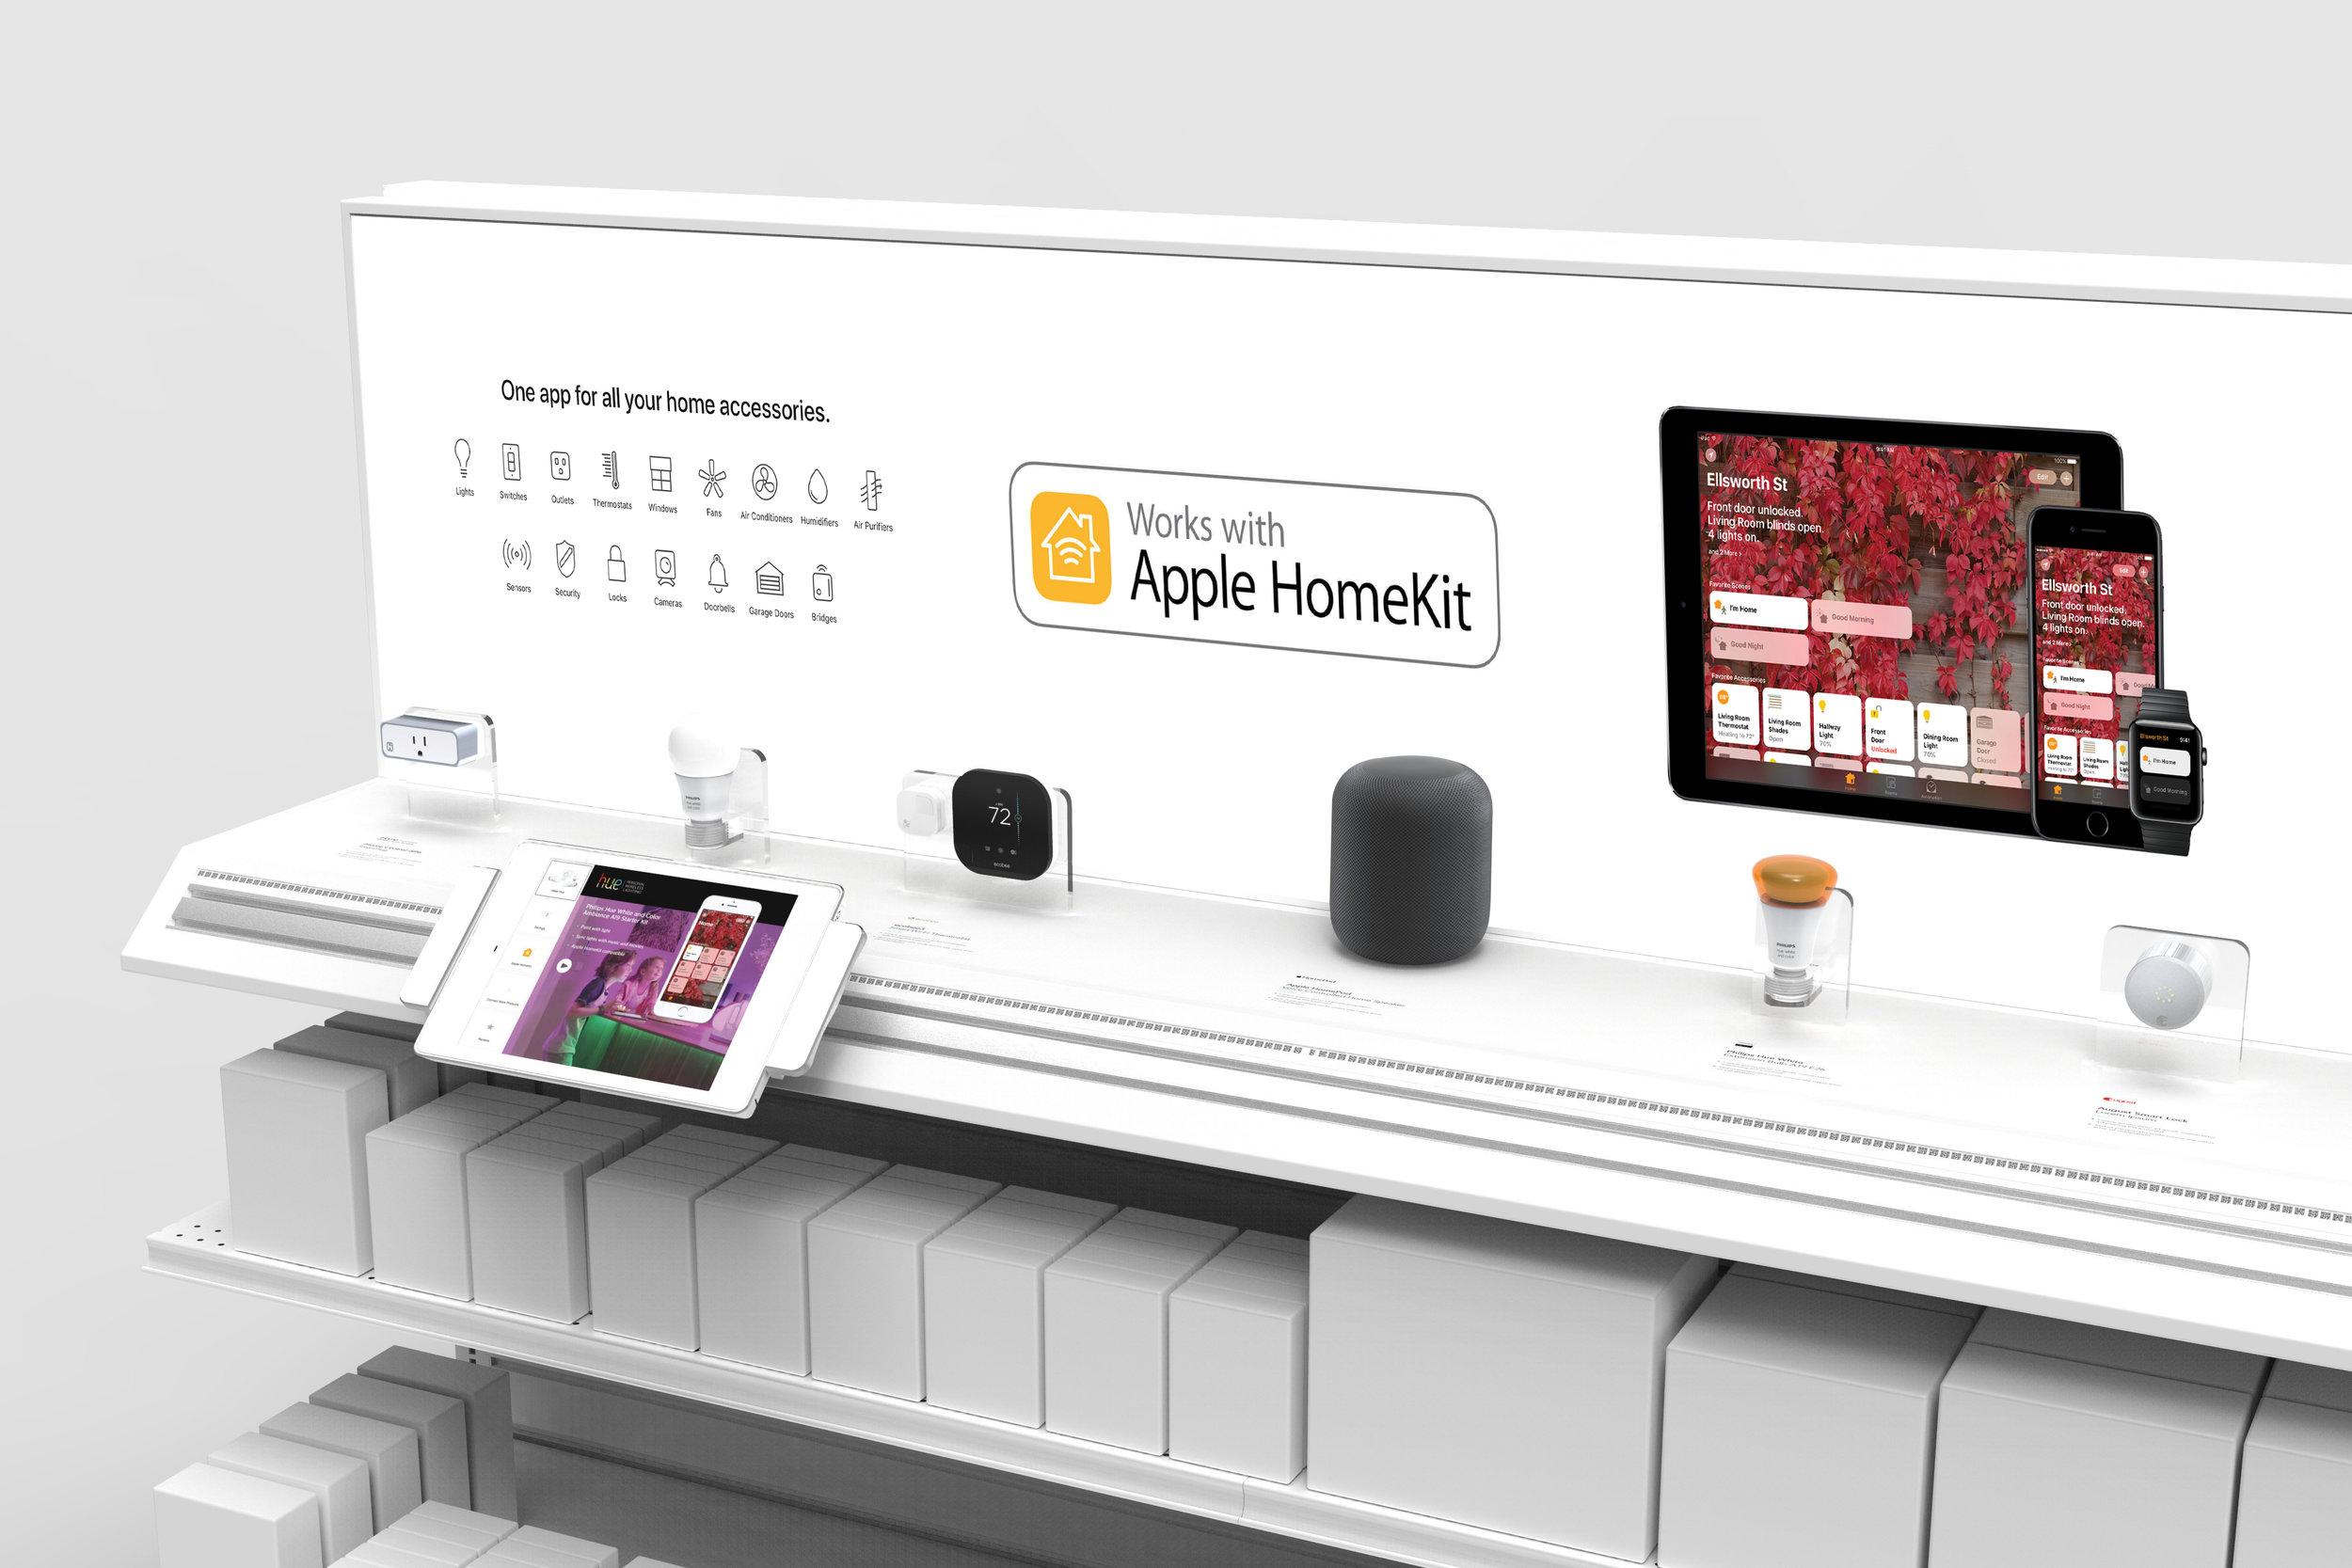 17761 BBY Apple HomeKit Inline 01A - June20 Detail Homepod [6 8 17_PG]_edit.jpg